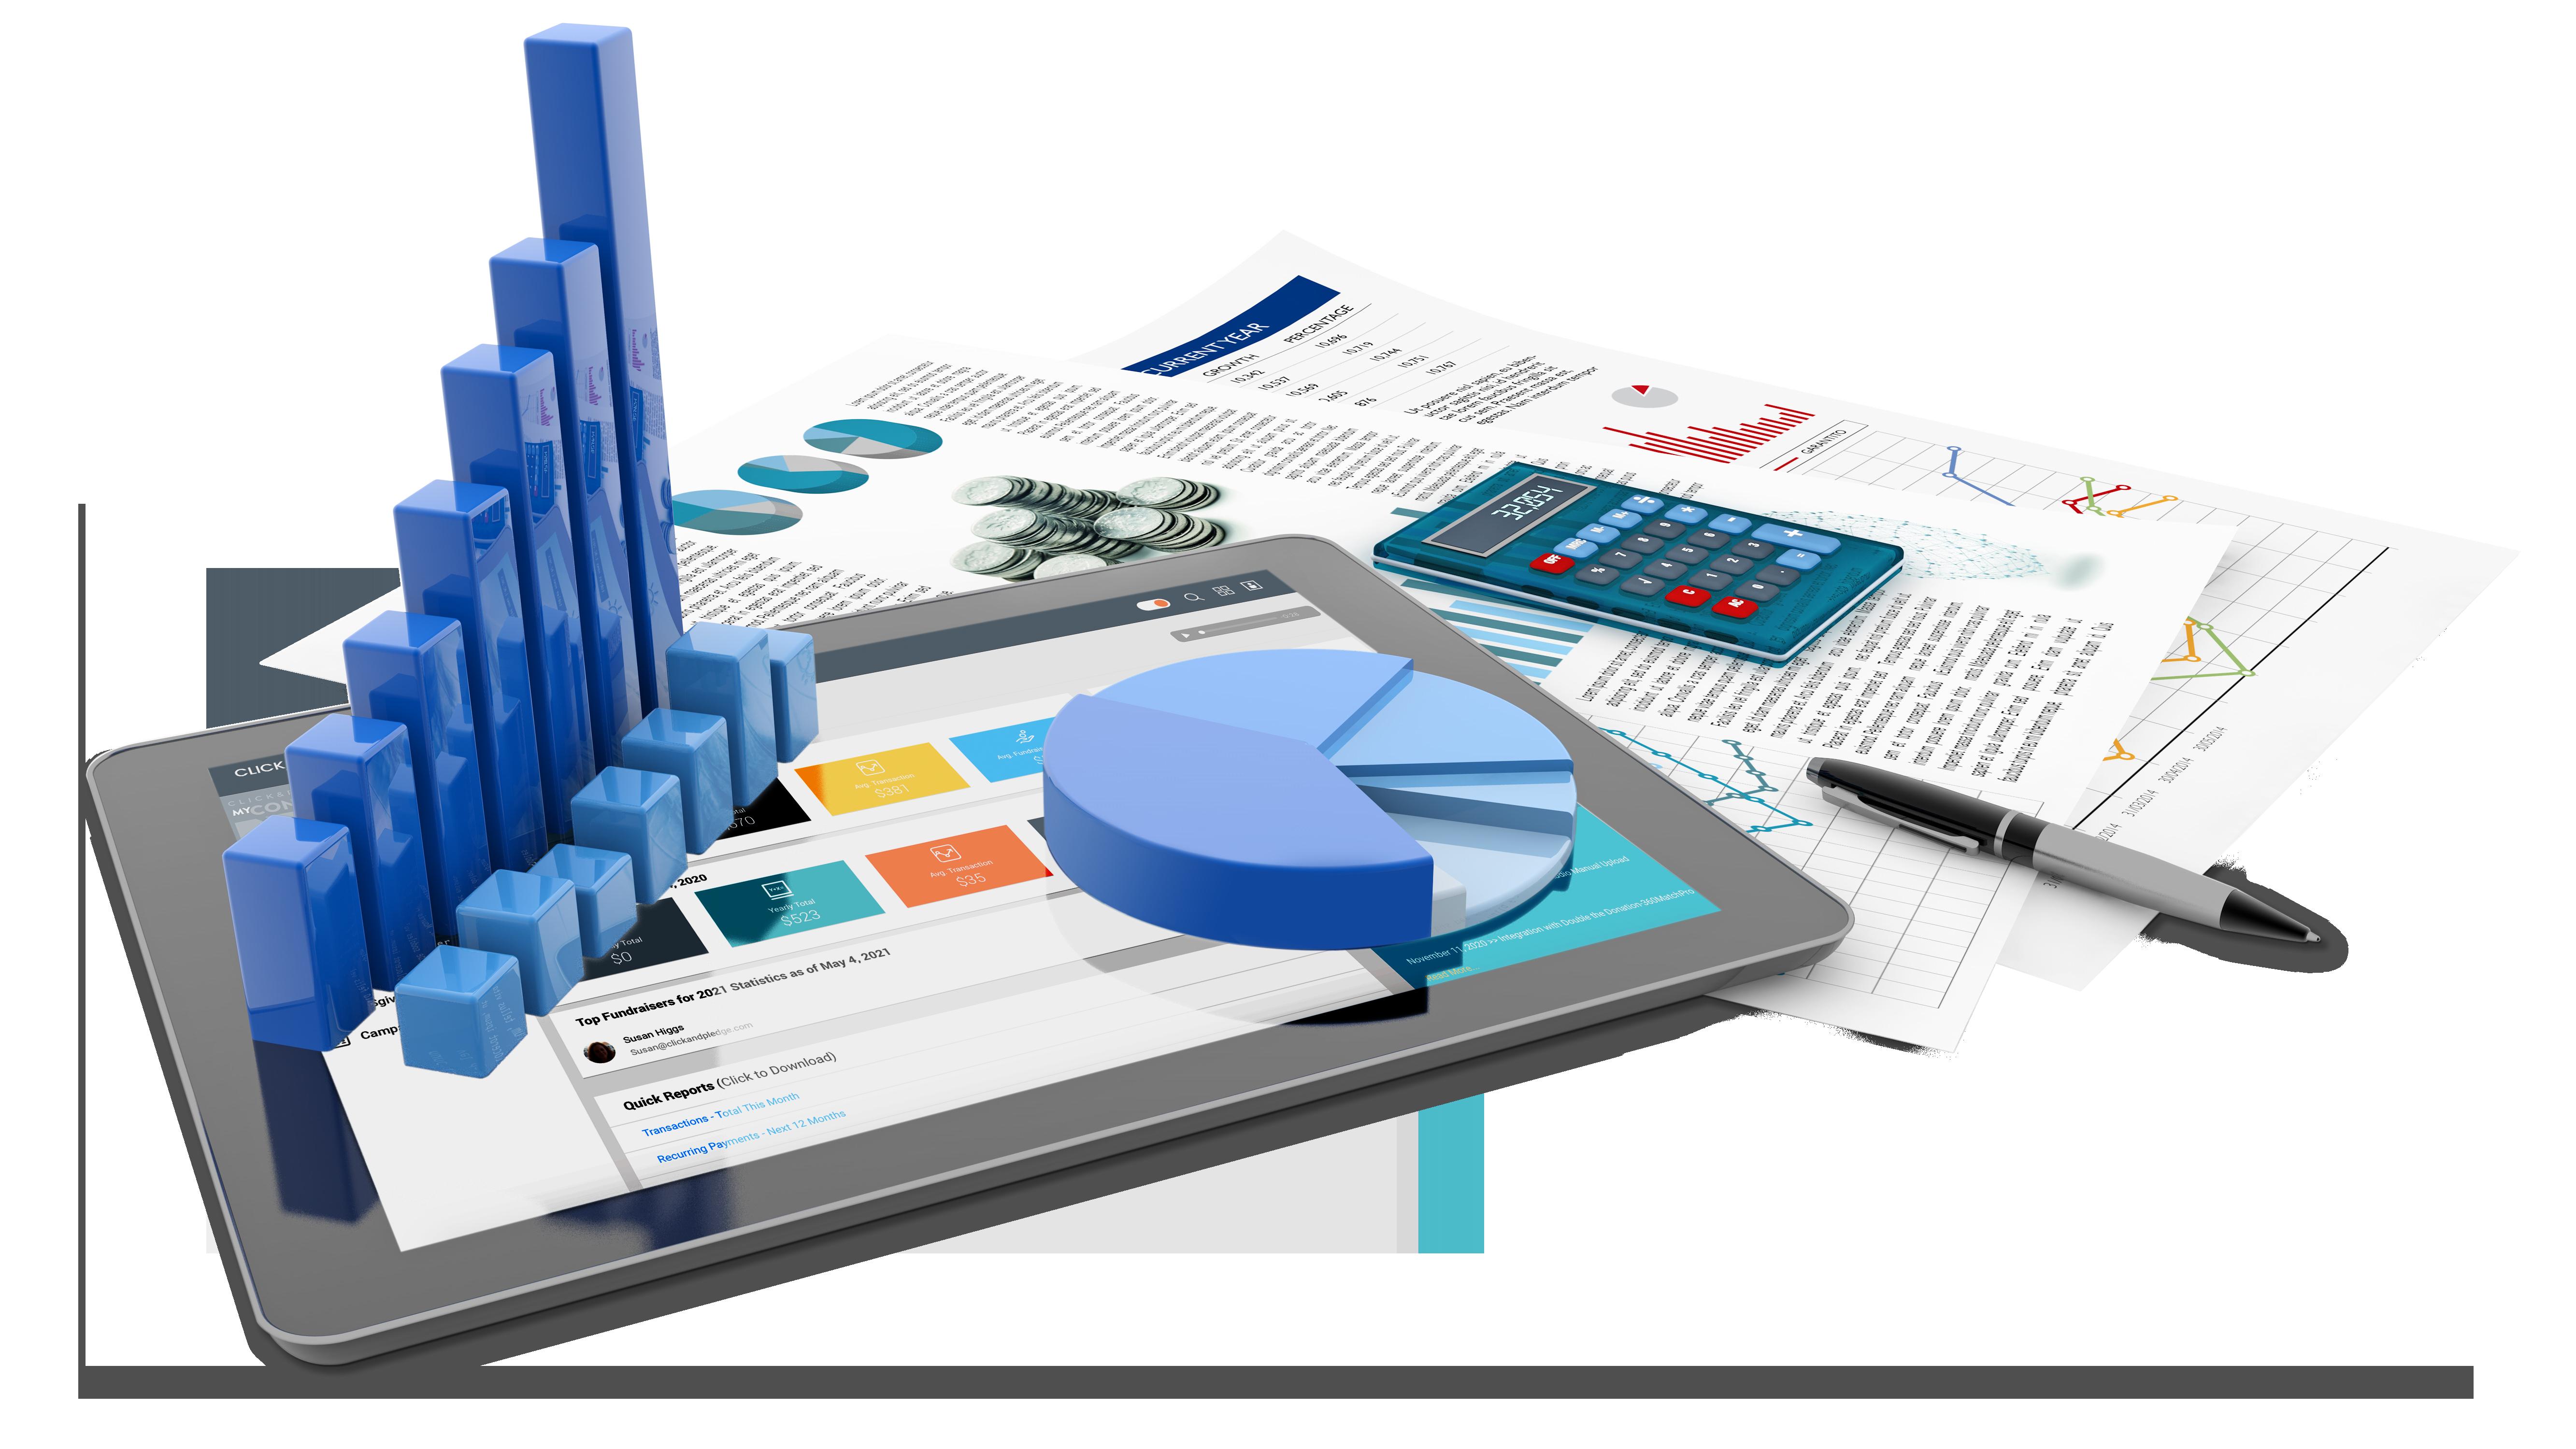 View prebuilt reports to monitor important metrics